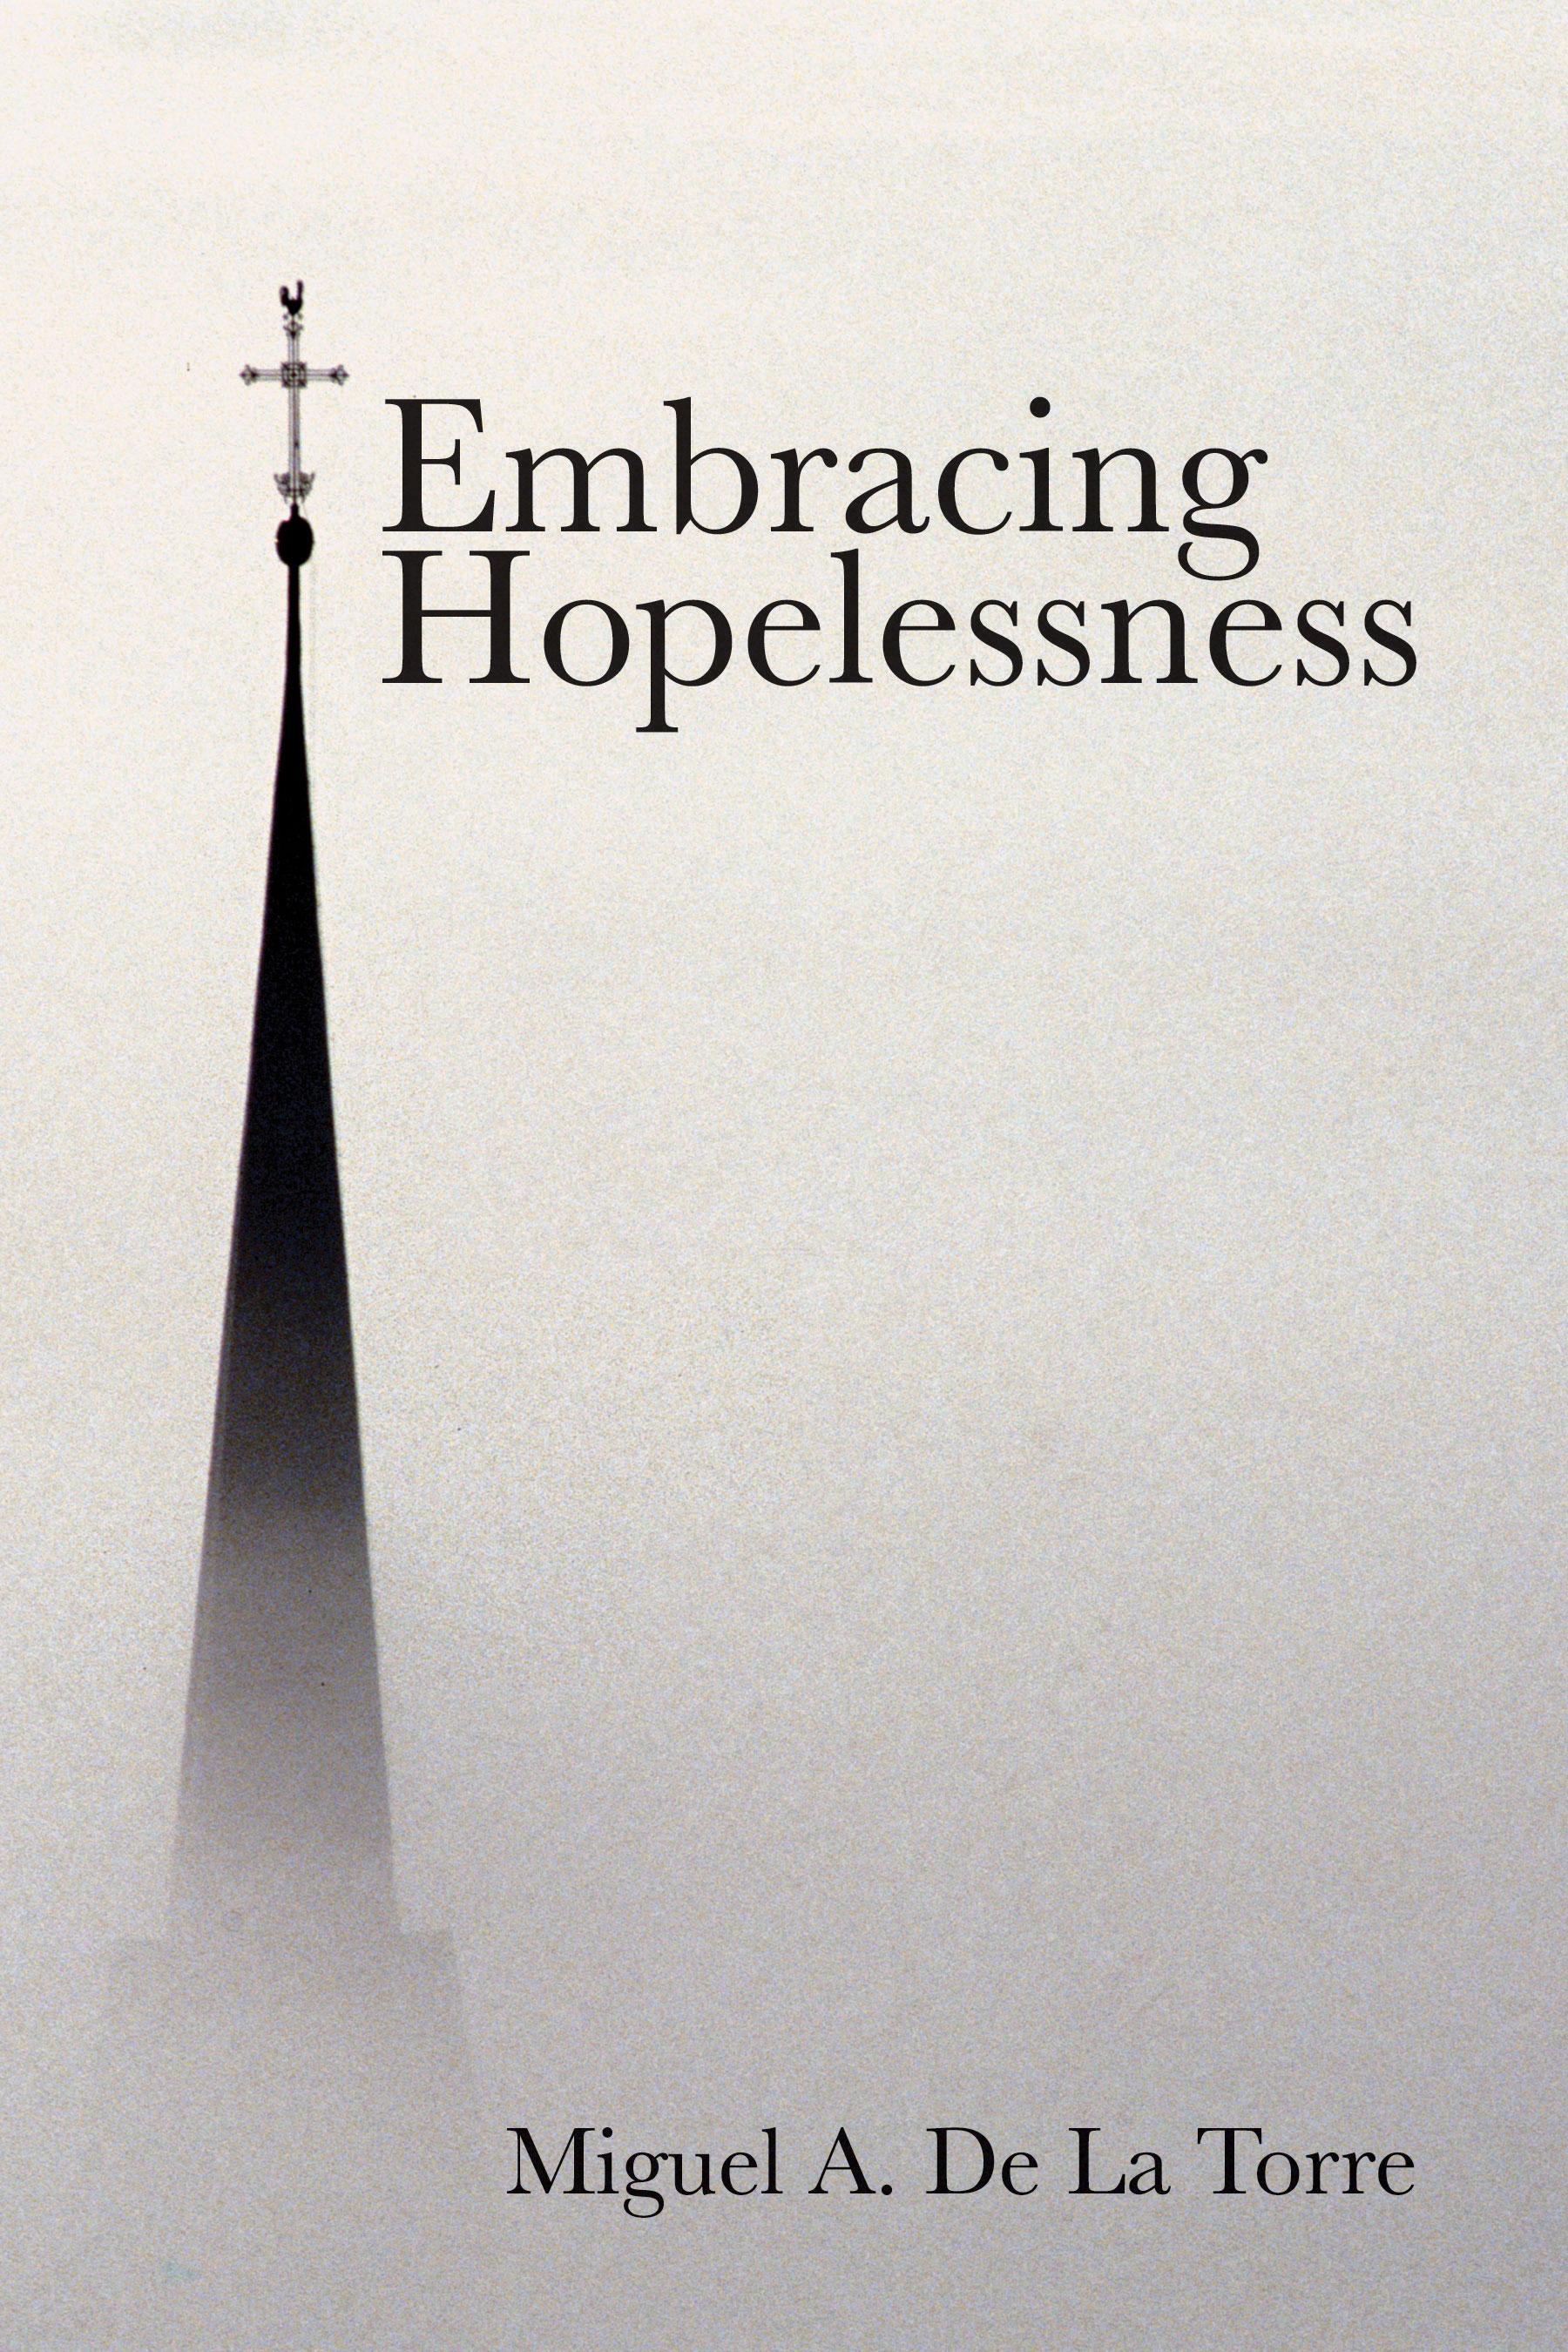 Embracing Hopelessness.jpg